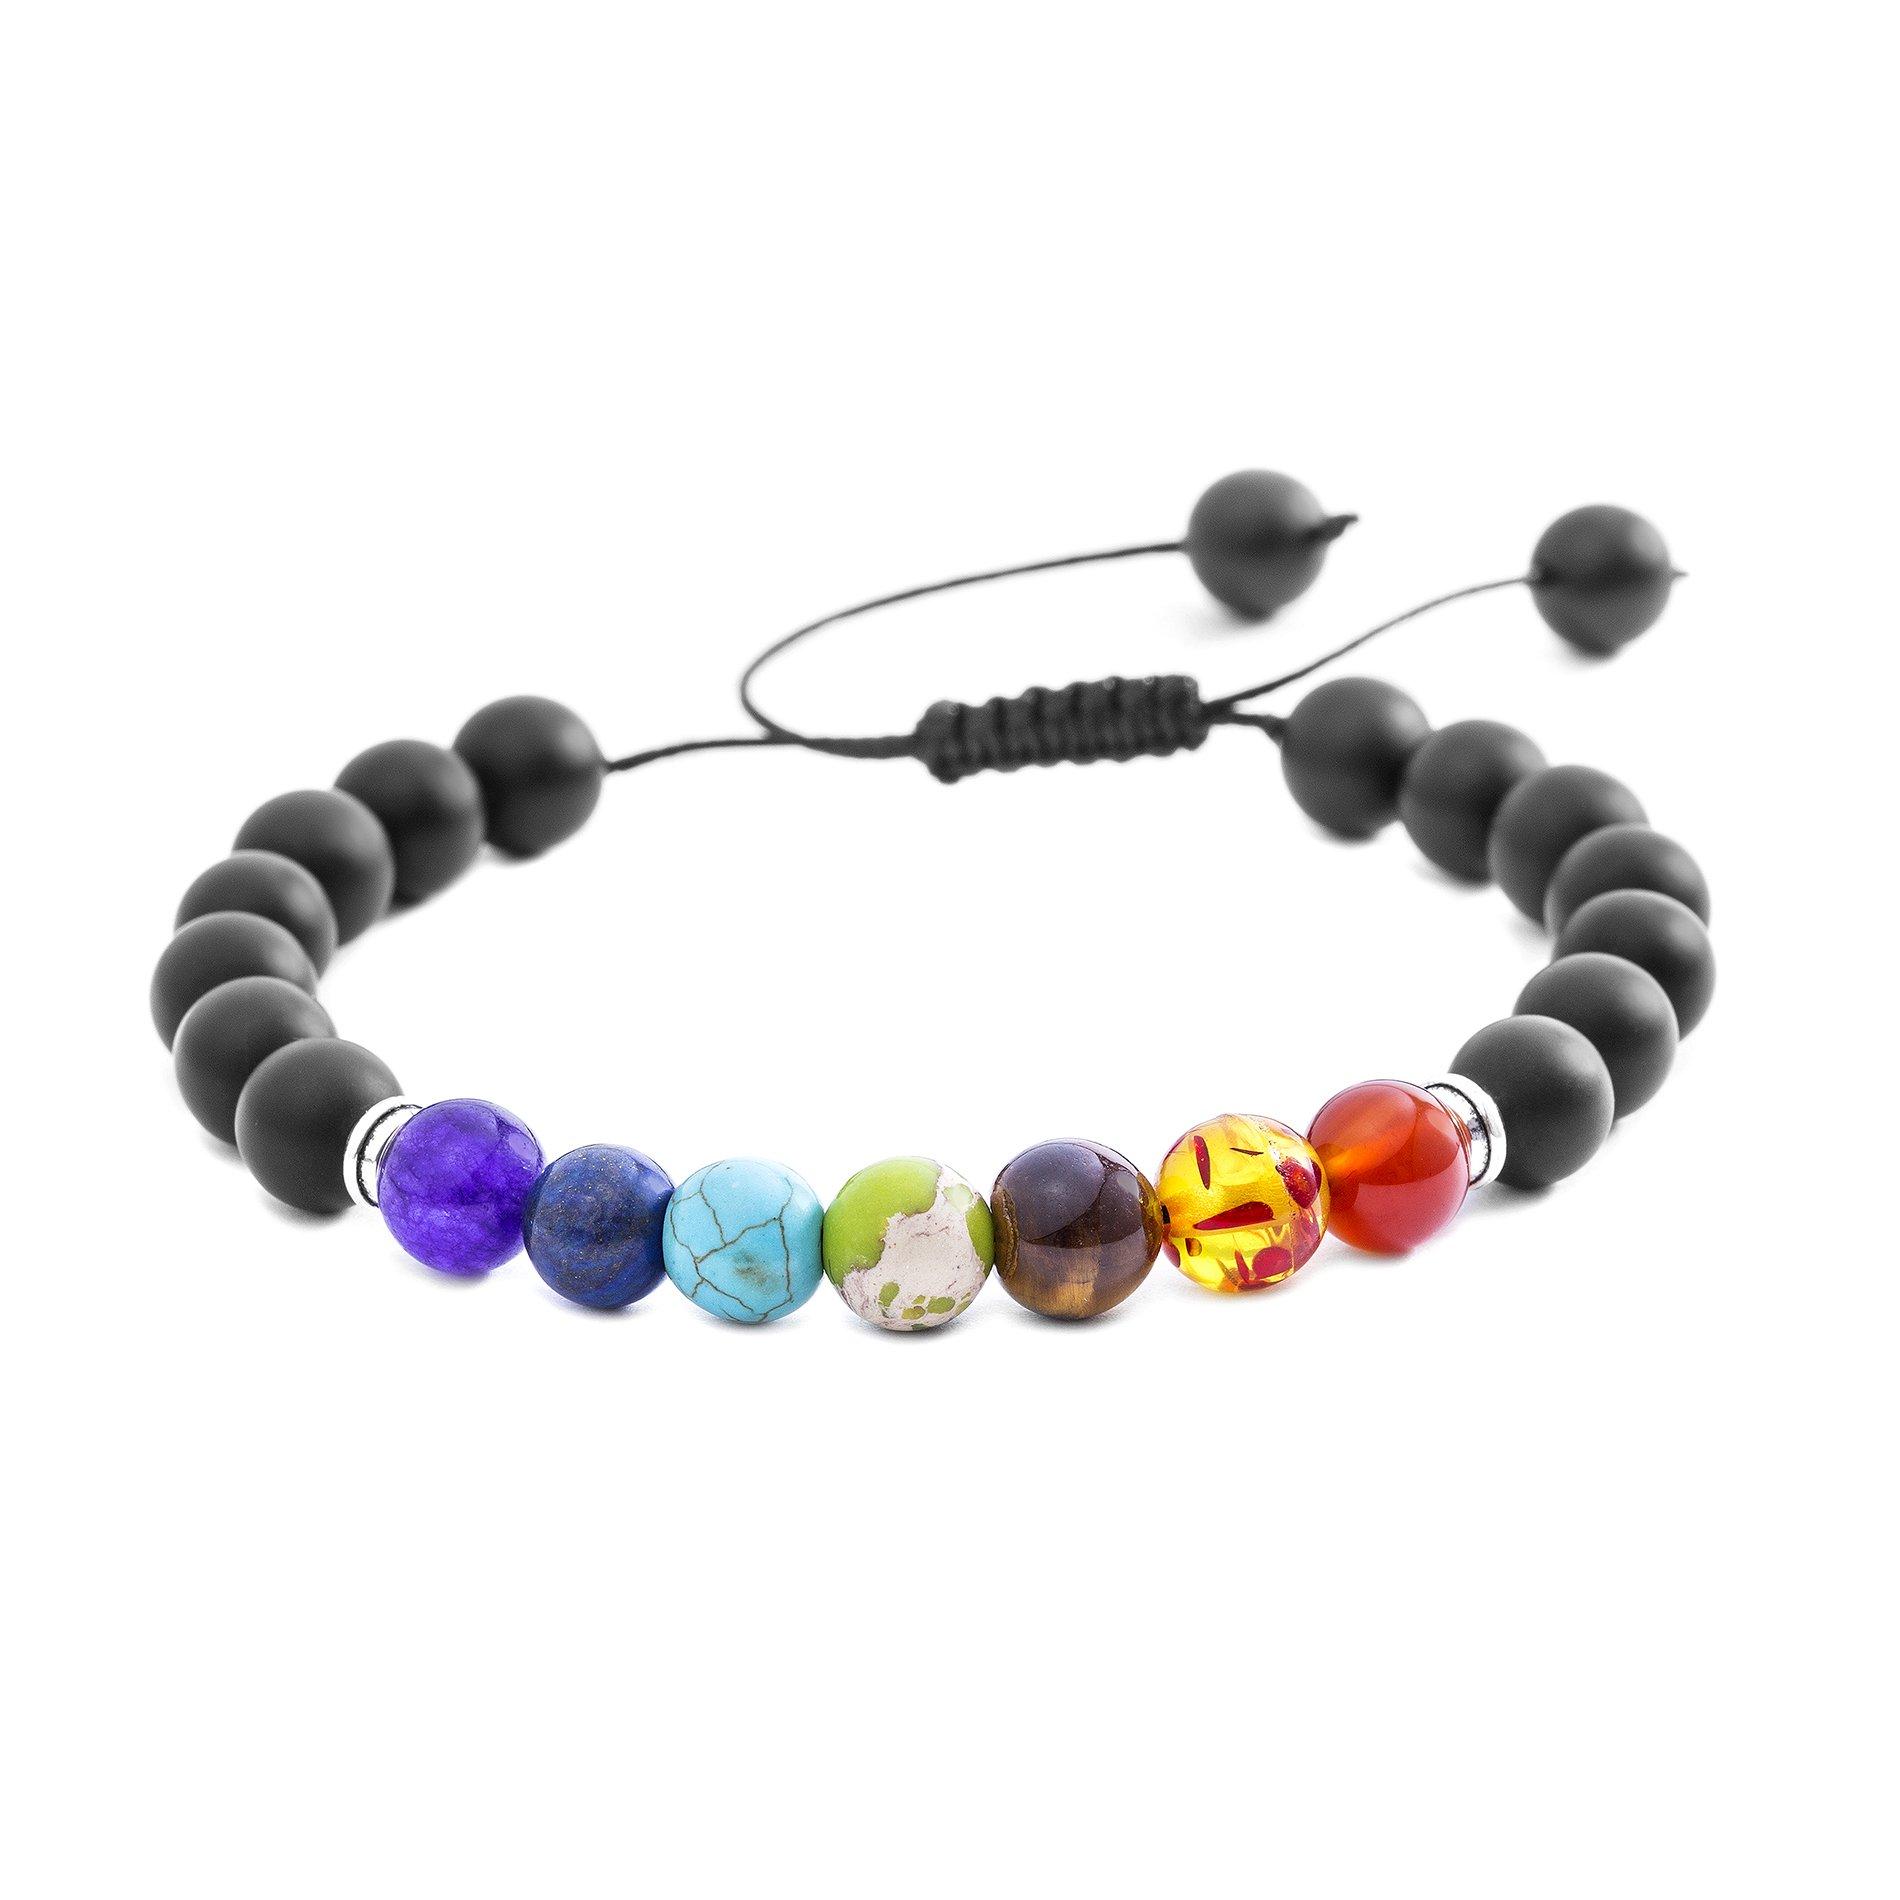 Willowbird Men/Woman Genuine Multi Color Agate 8mm Stone Healing Style Yoga Bead Adjustable Bolo Bracelet (Matte Black)